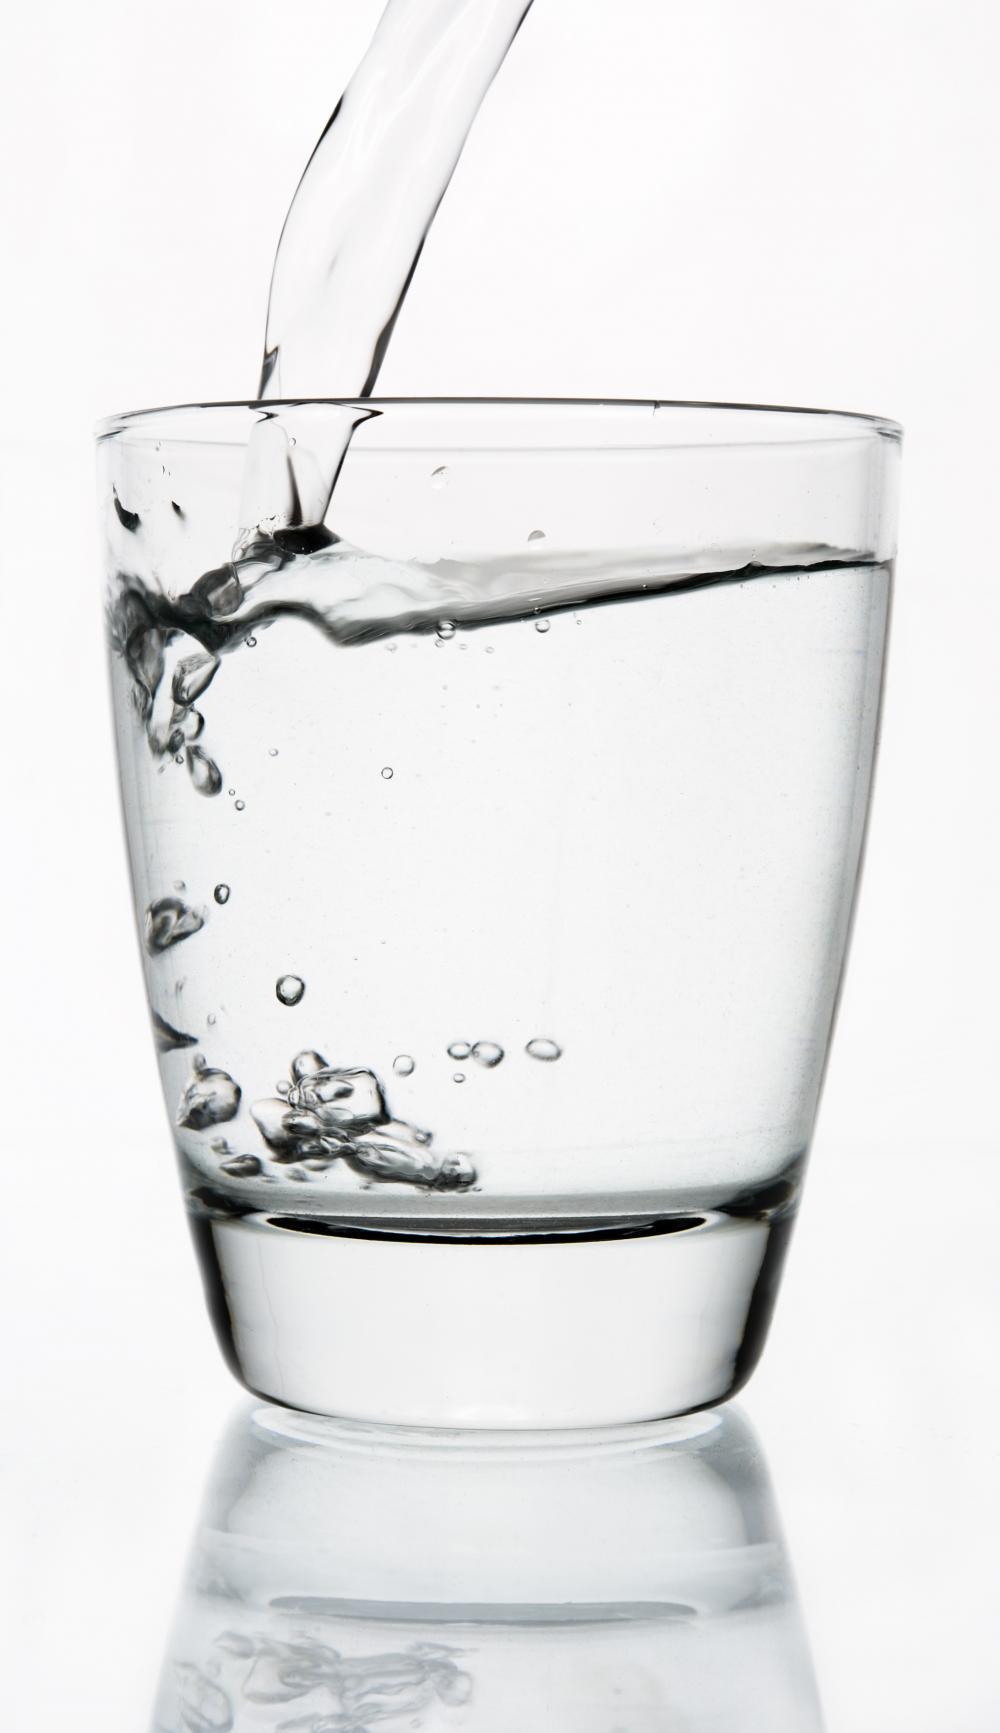 https://i1.wp.com/berryripe.com/wp-content/uploads/2012/10/glass-of-water.jpg